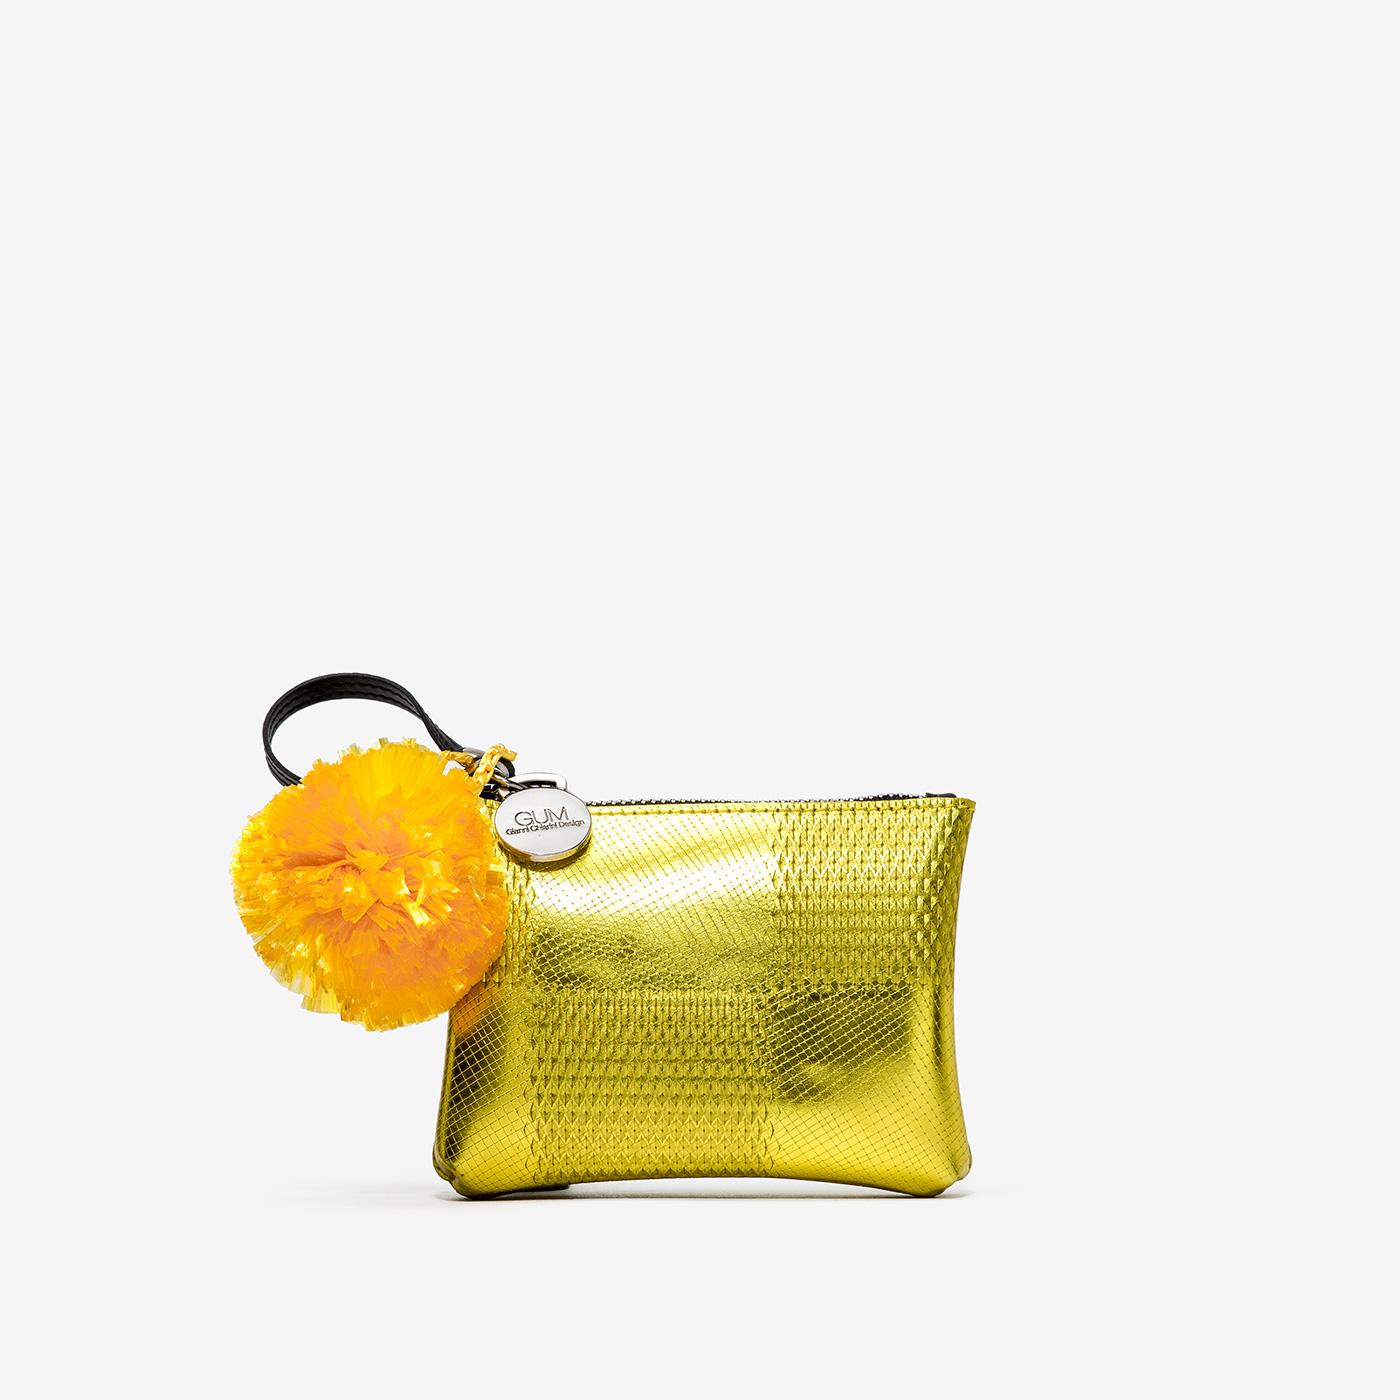 GUM: CLUTCH BAG KEYRING WITH STARS